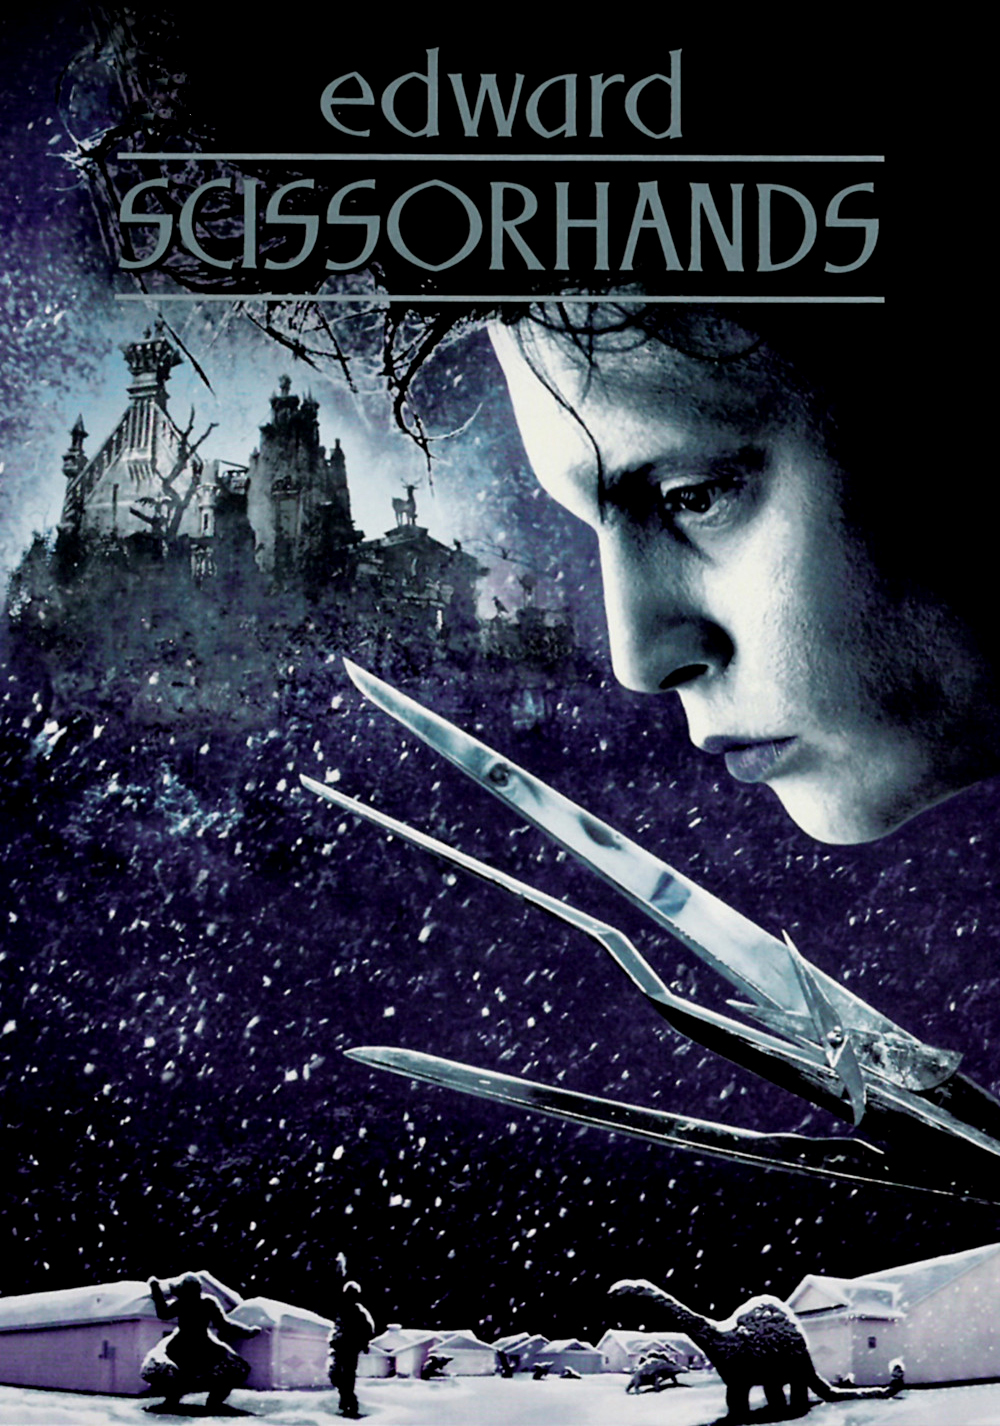 Essay on edward scissorhands the movie